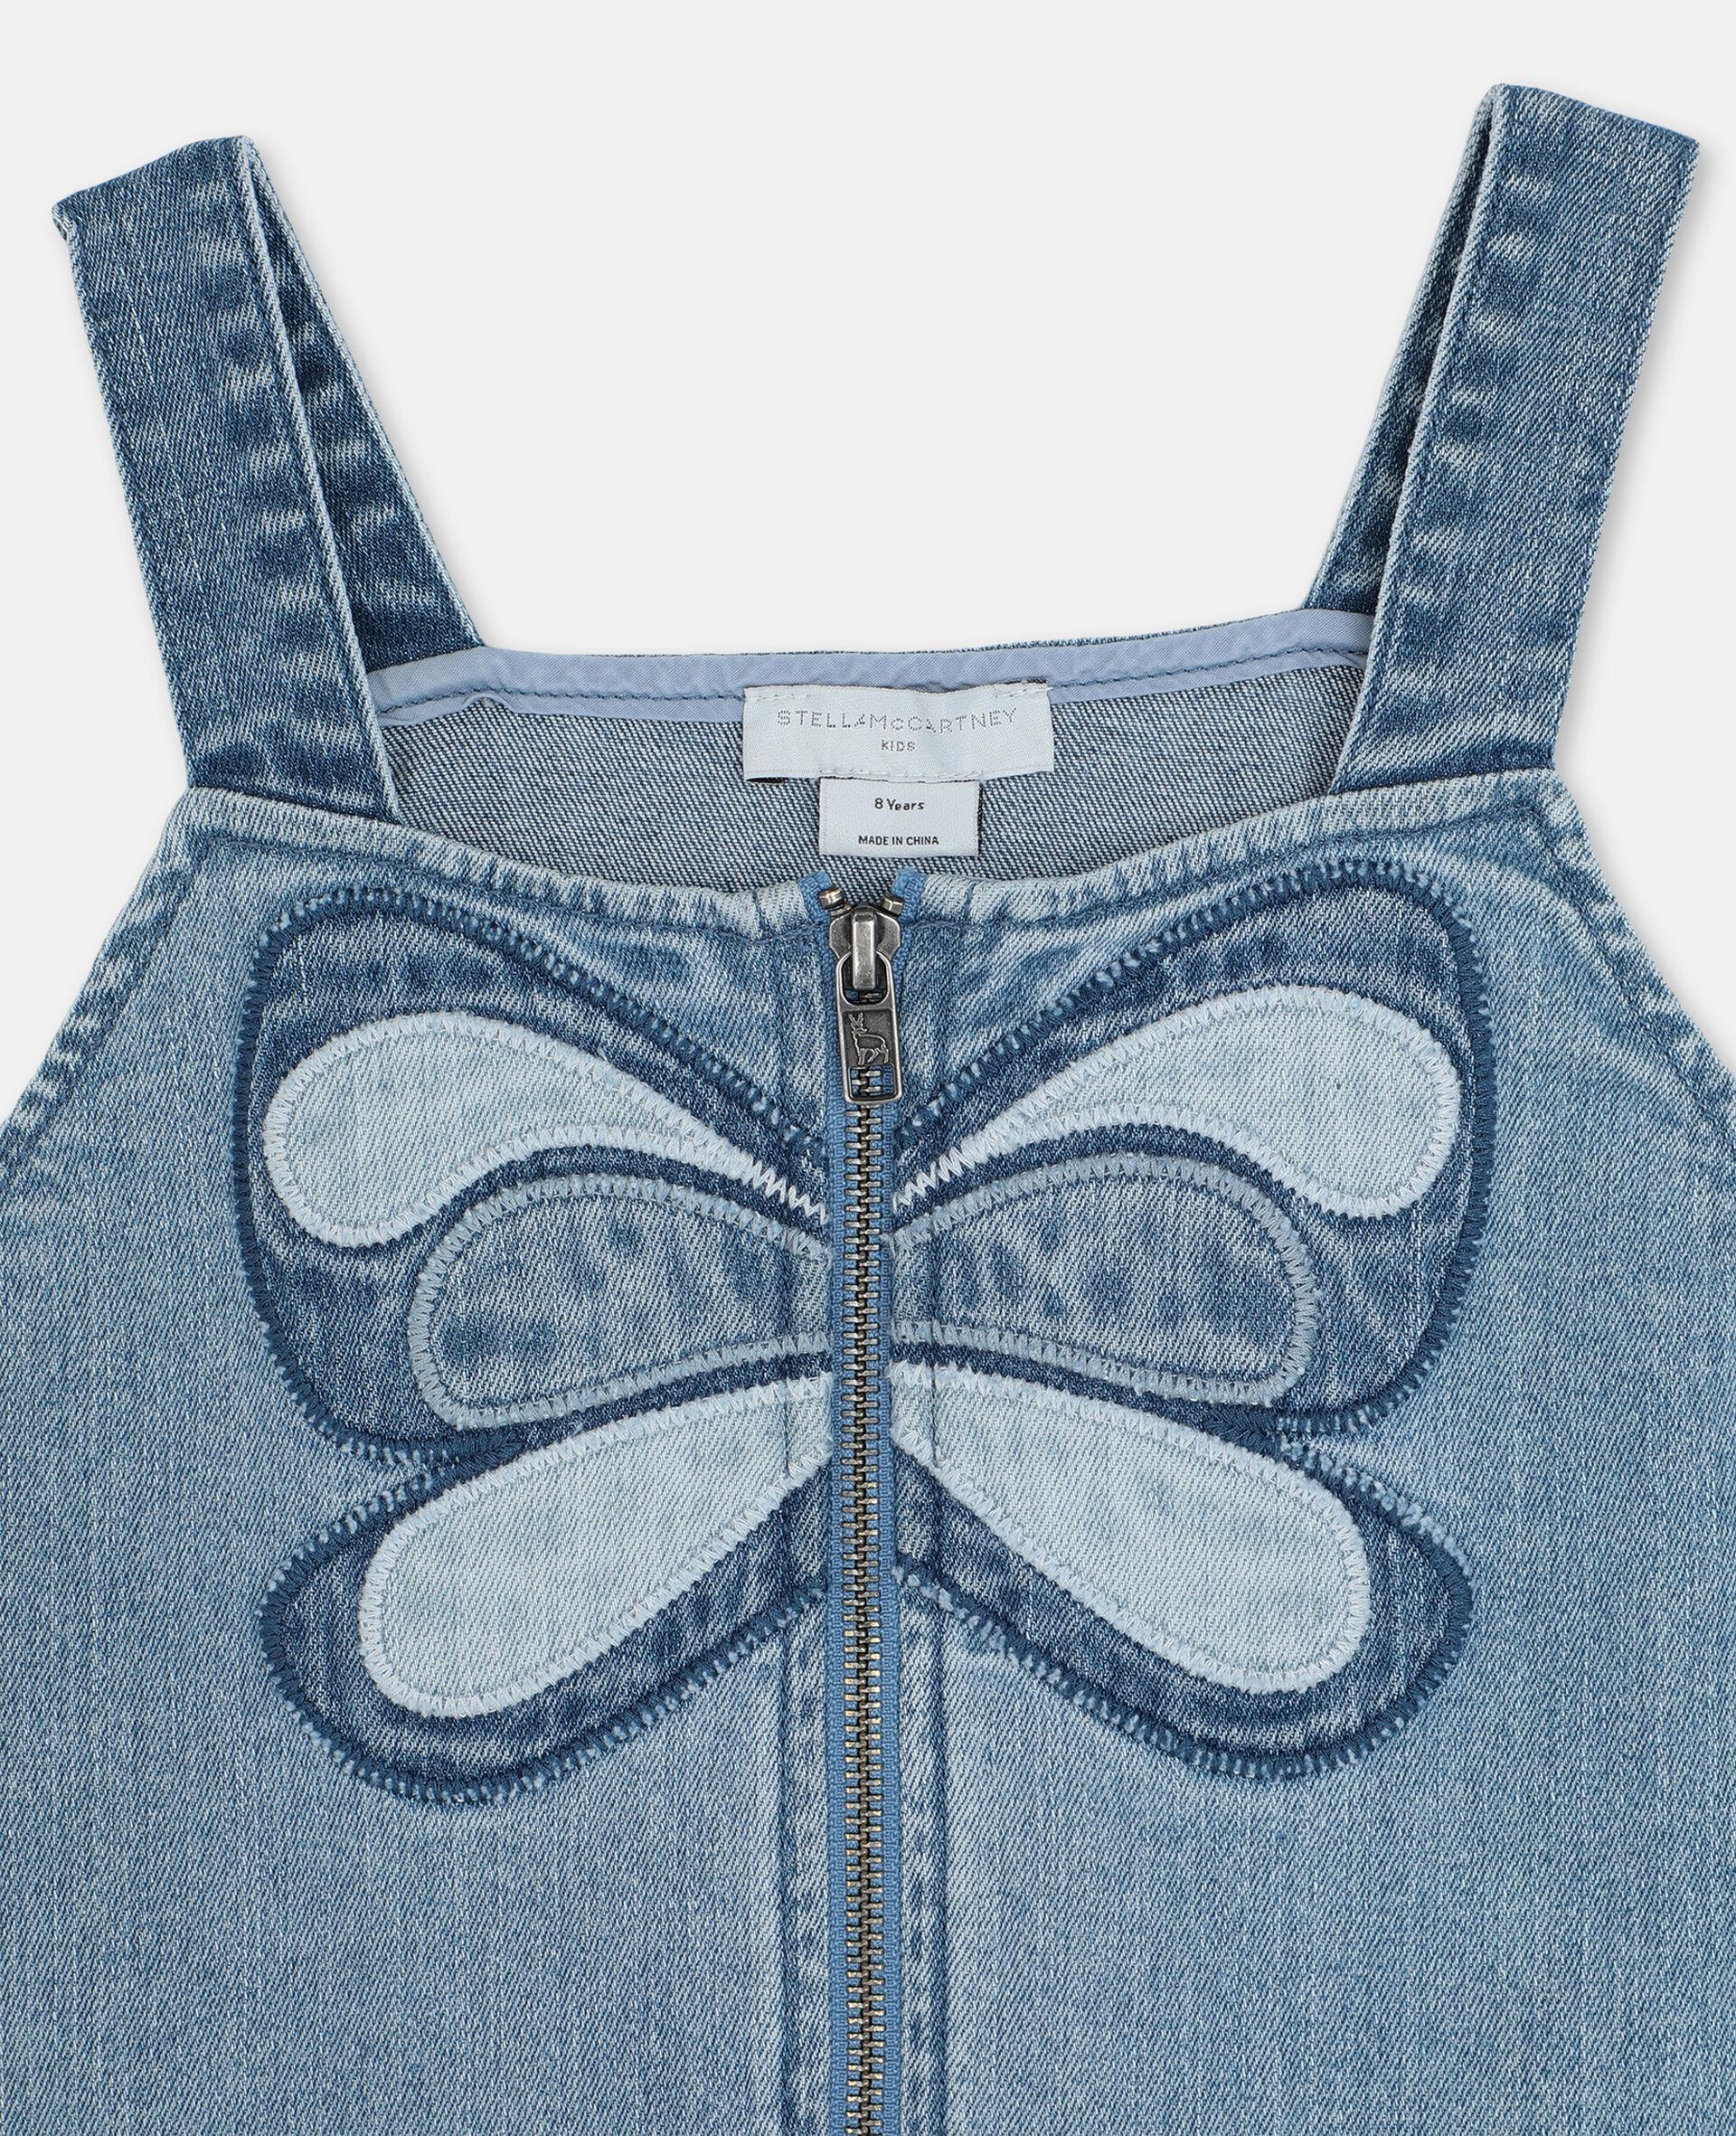 Denimkleid mit Schmetterlingen-Blau-large image number 1